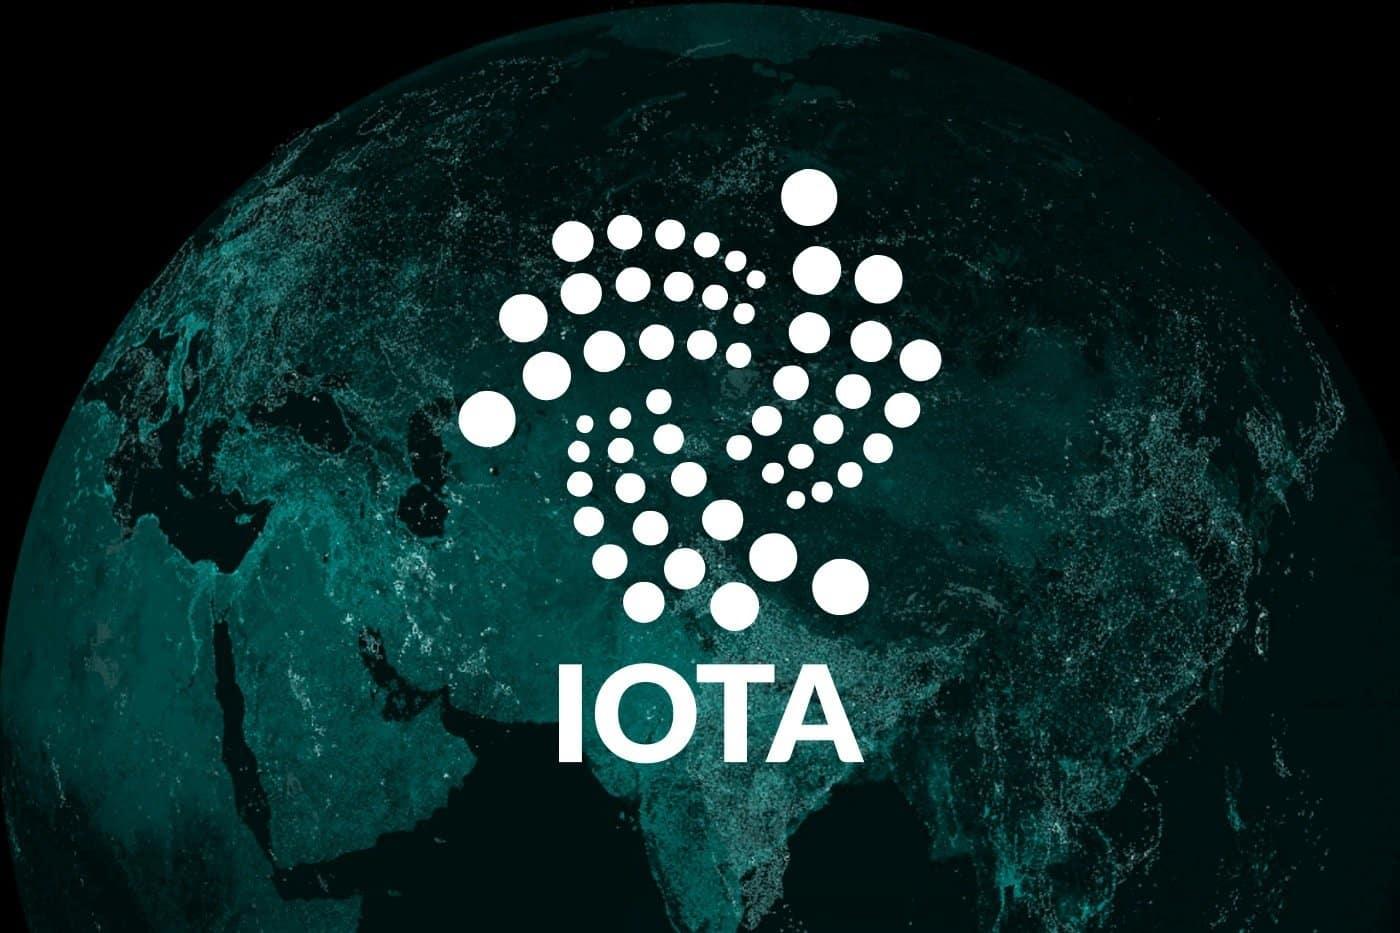 tecnologia-blockchain-criptomoedas-iota-iot